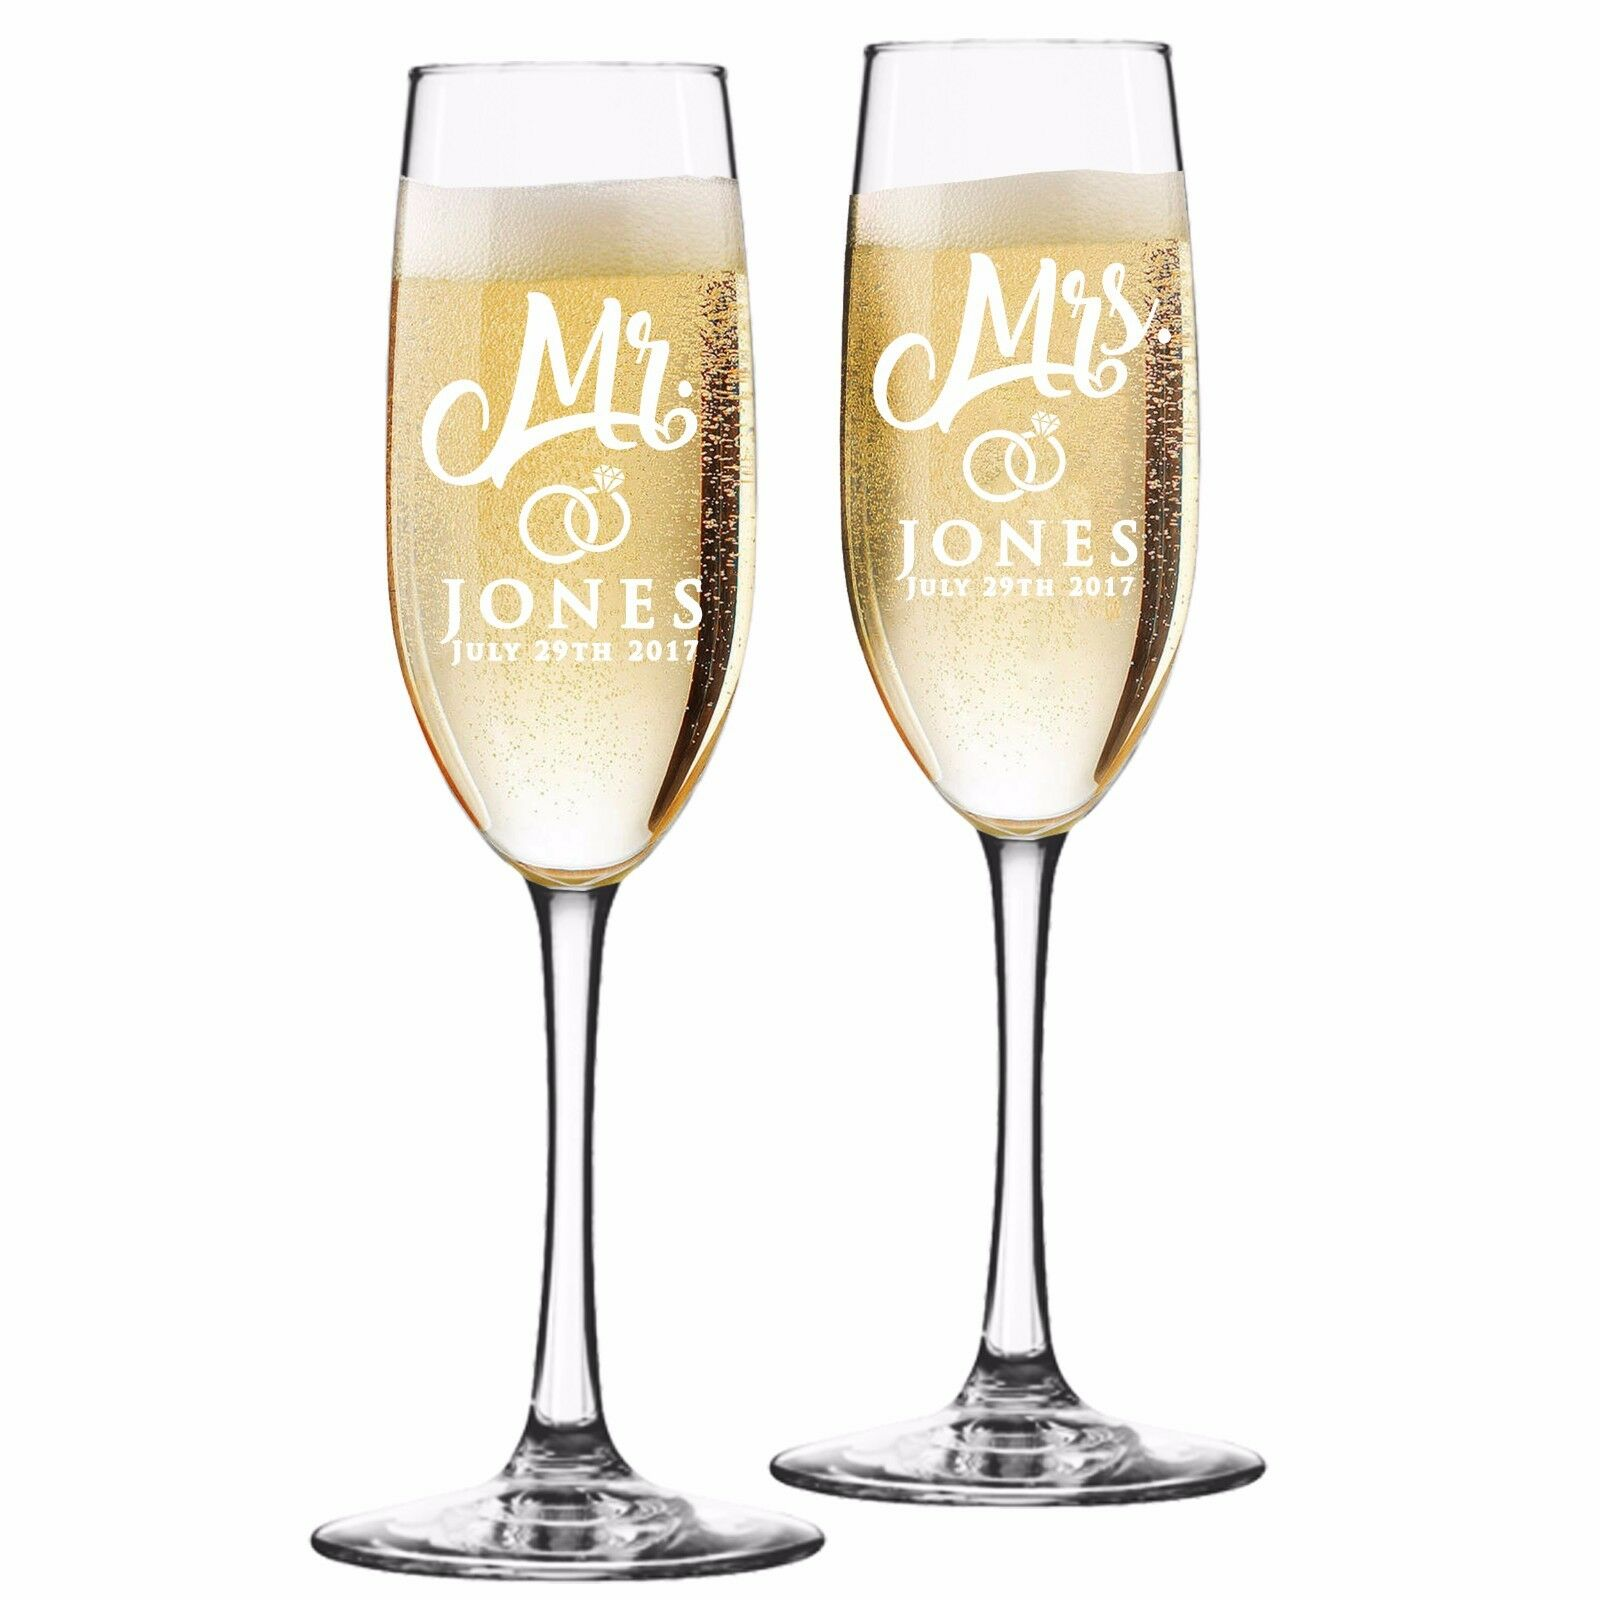 Wedding Gift Champagne Flutes: Custom Engraved Champagne Flutes For Wedding